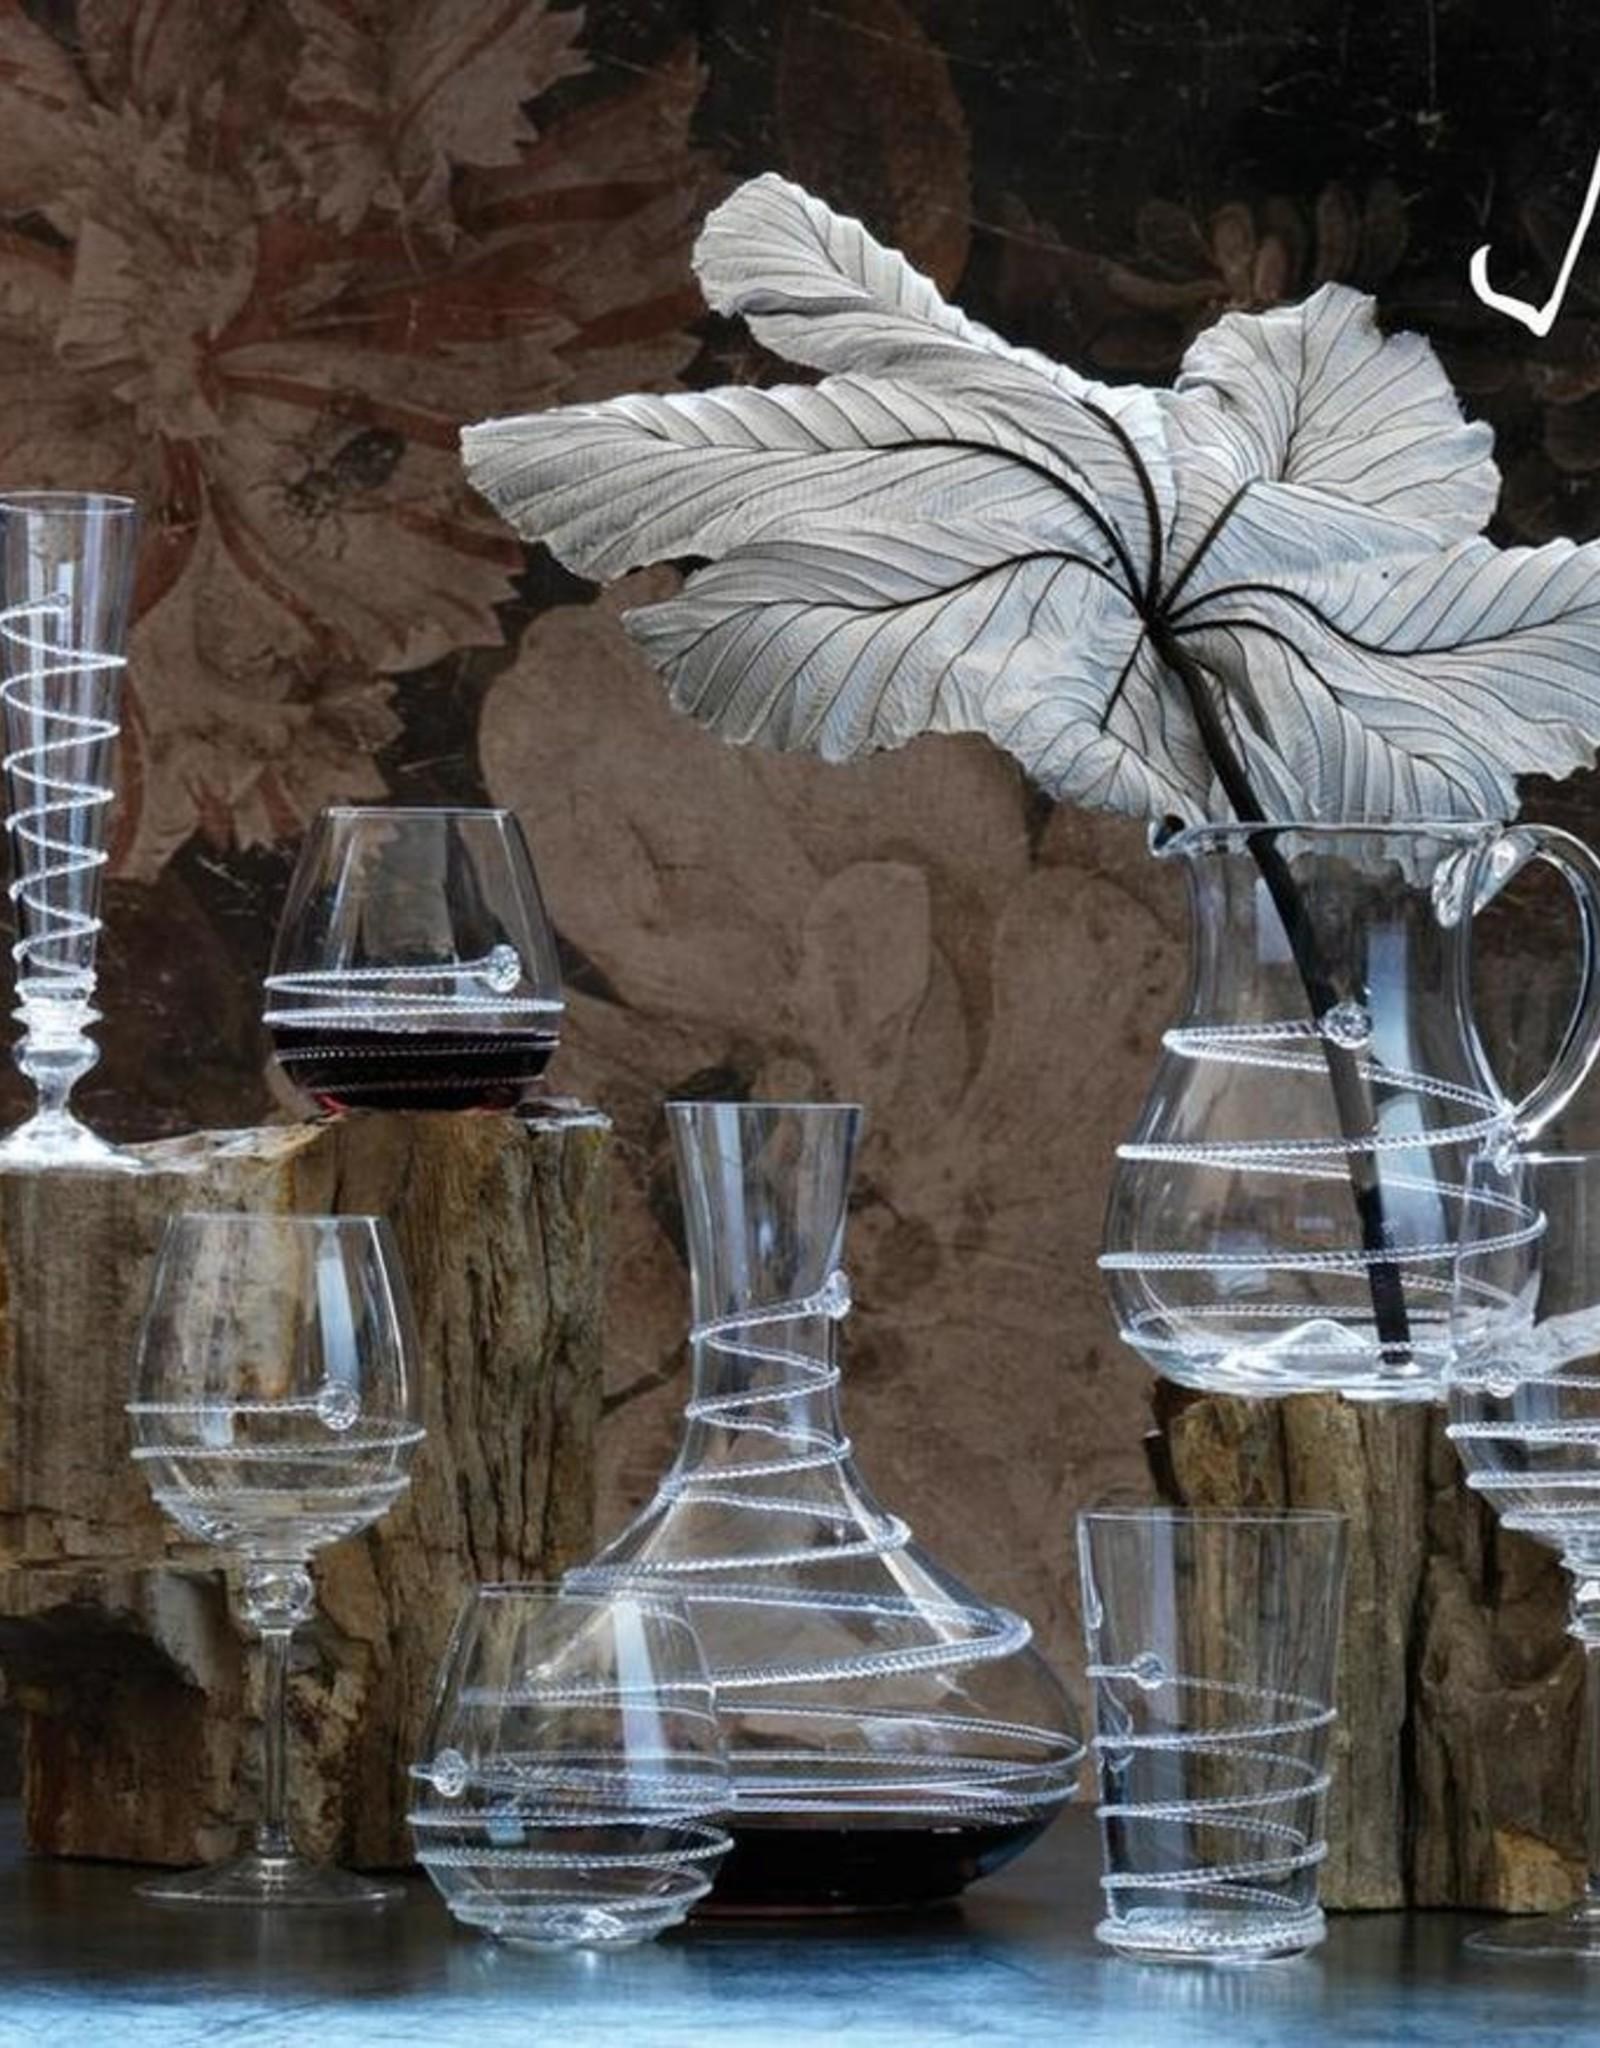 Juliska Pair of Amalia Champagne Flutes - Boxed Set